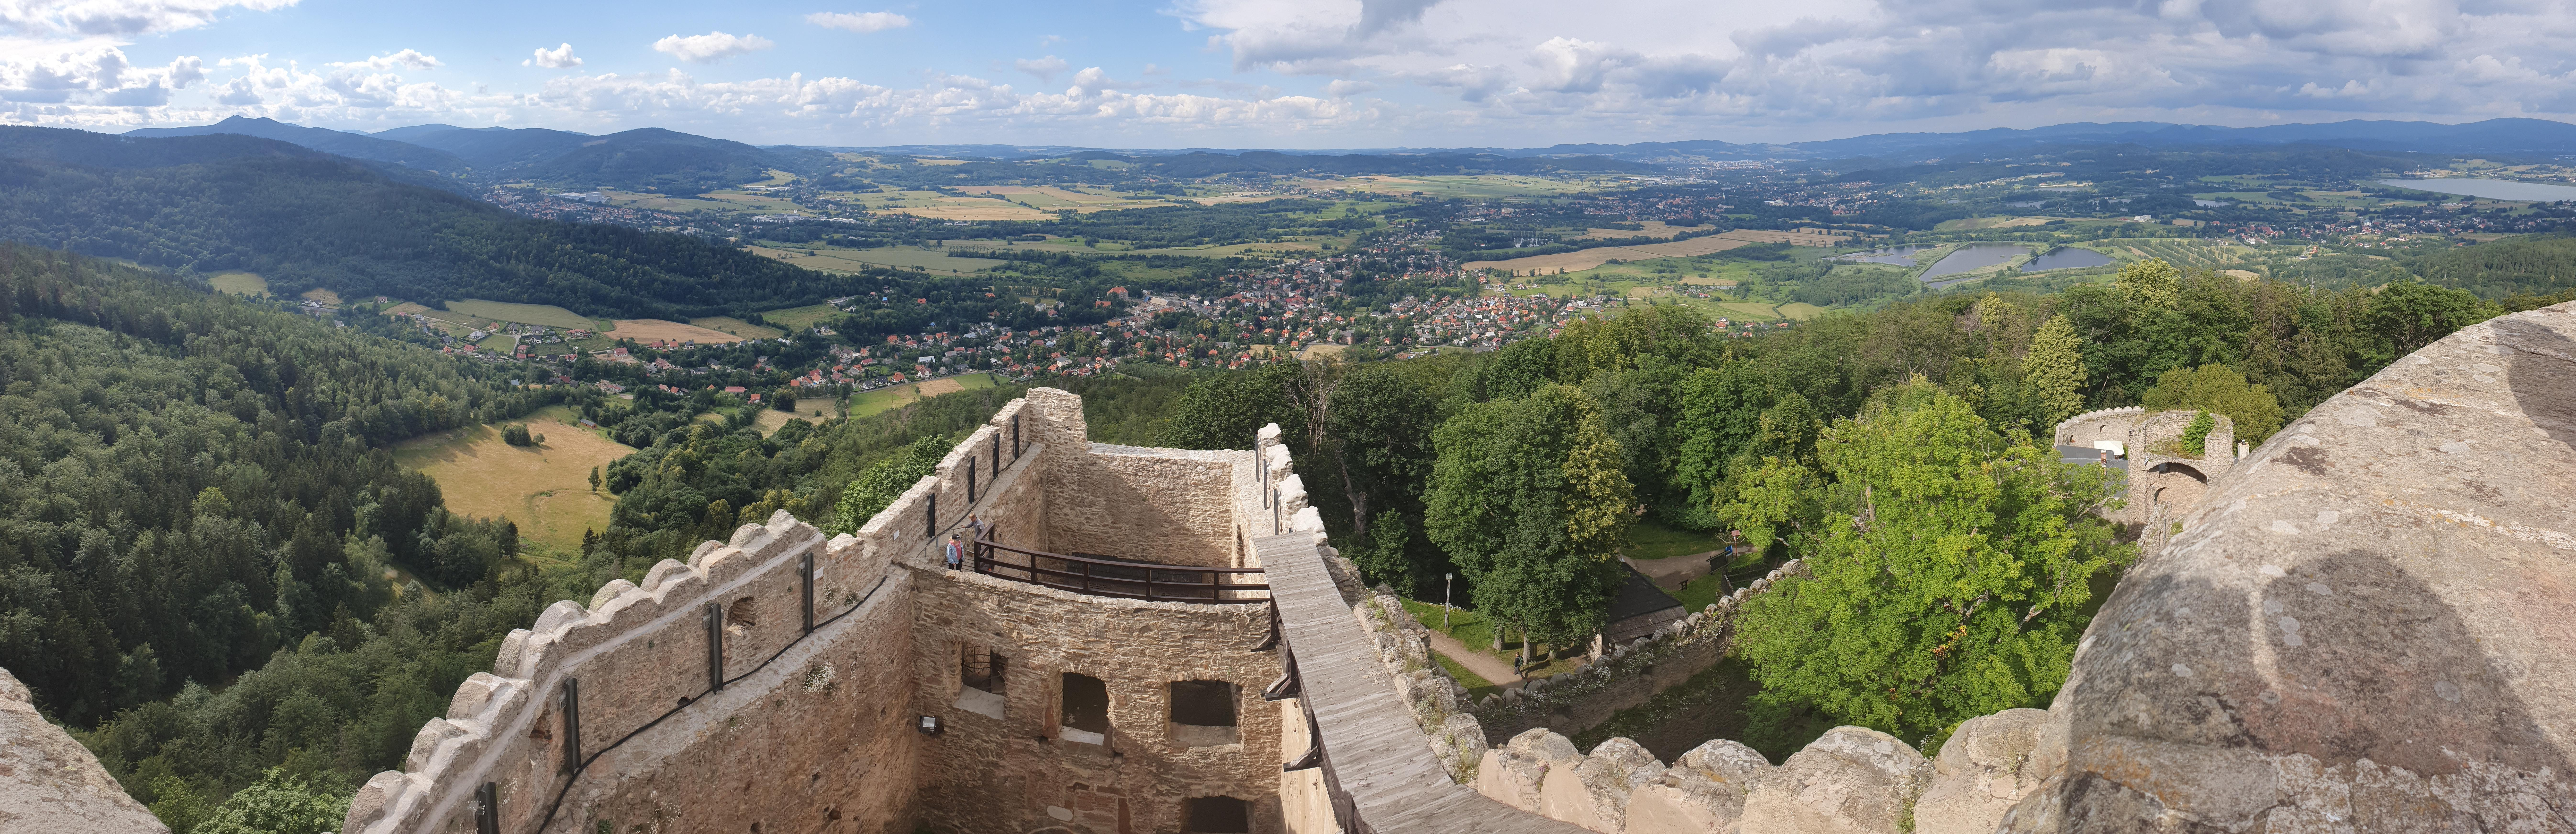 Chojnik castle | טירת חויניק